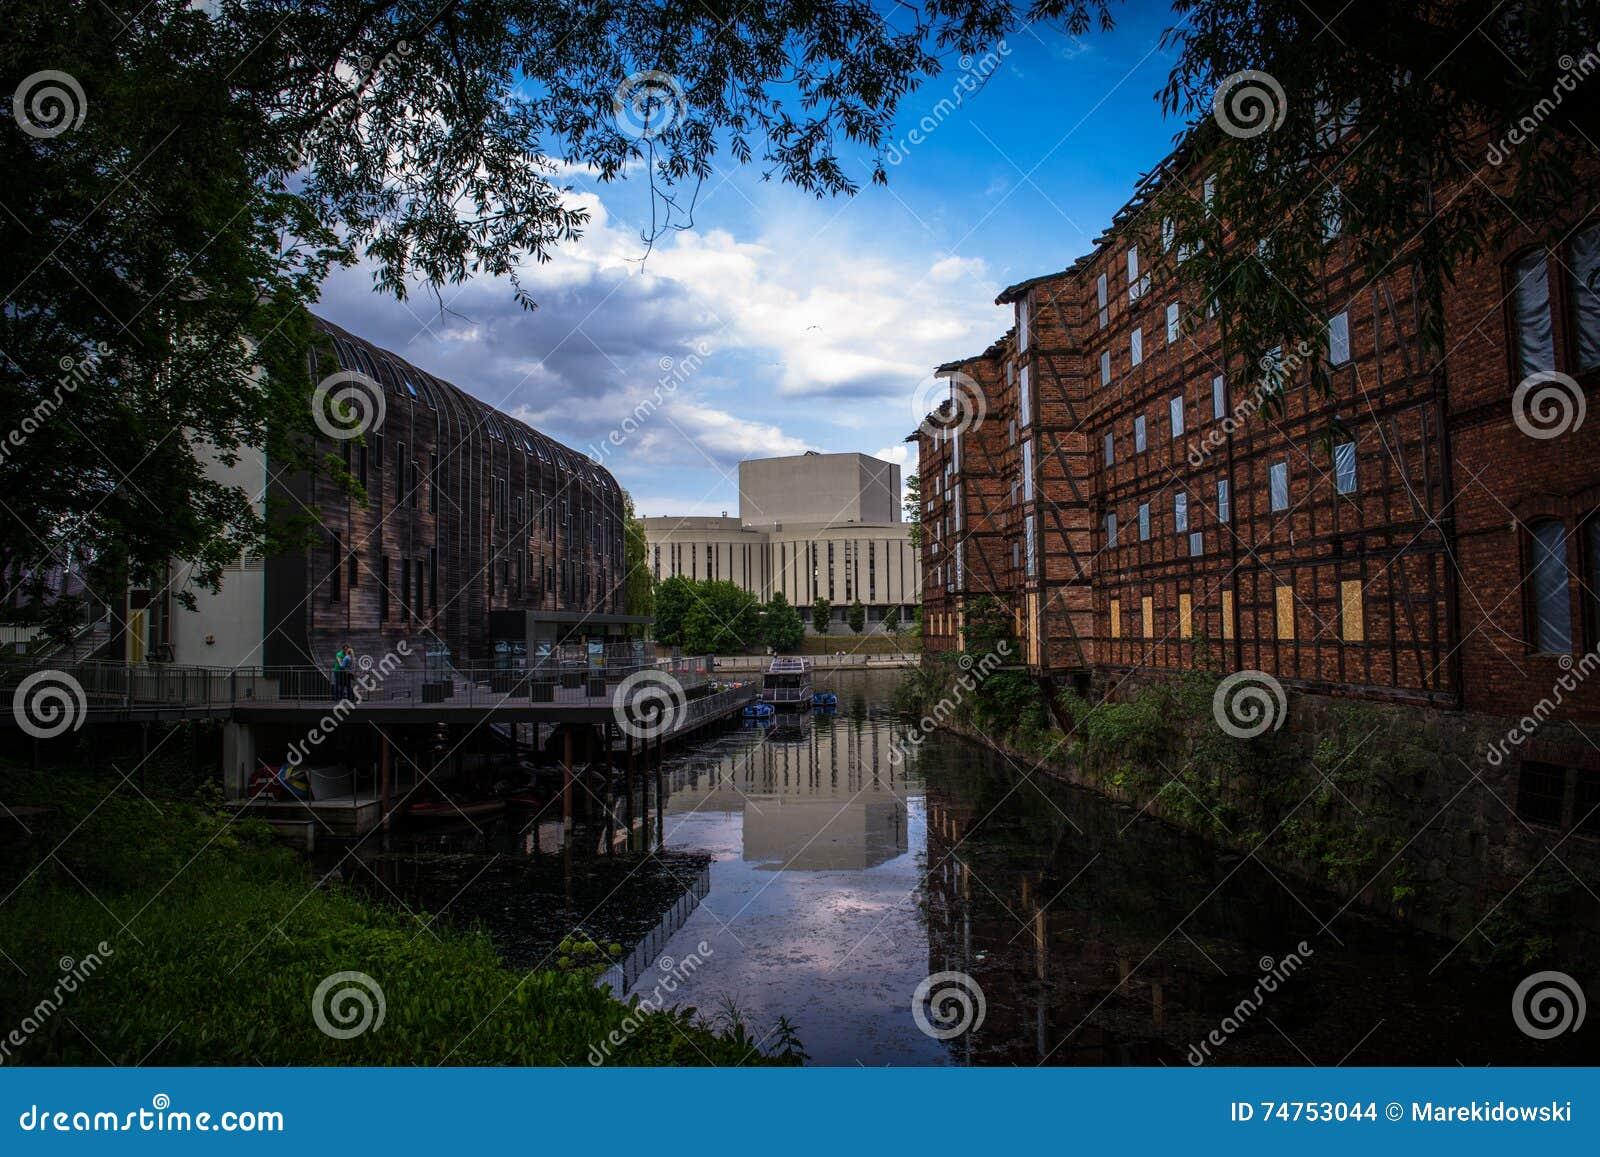 Bydgoszcz - σκοτεινό πανόραμα της πόλης